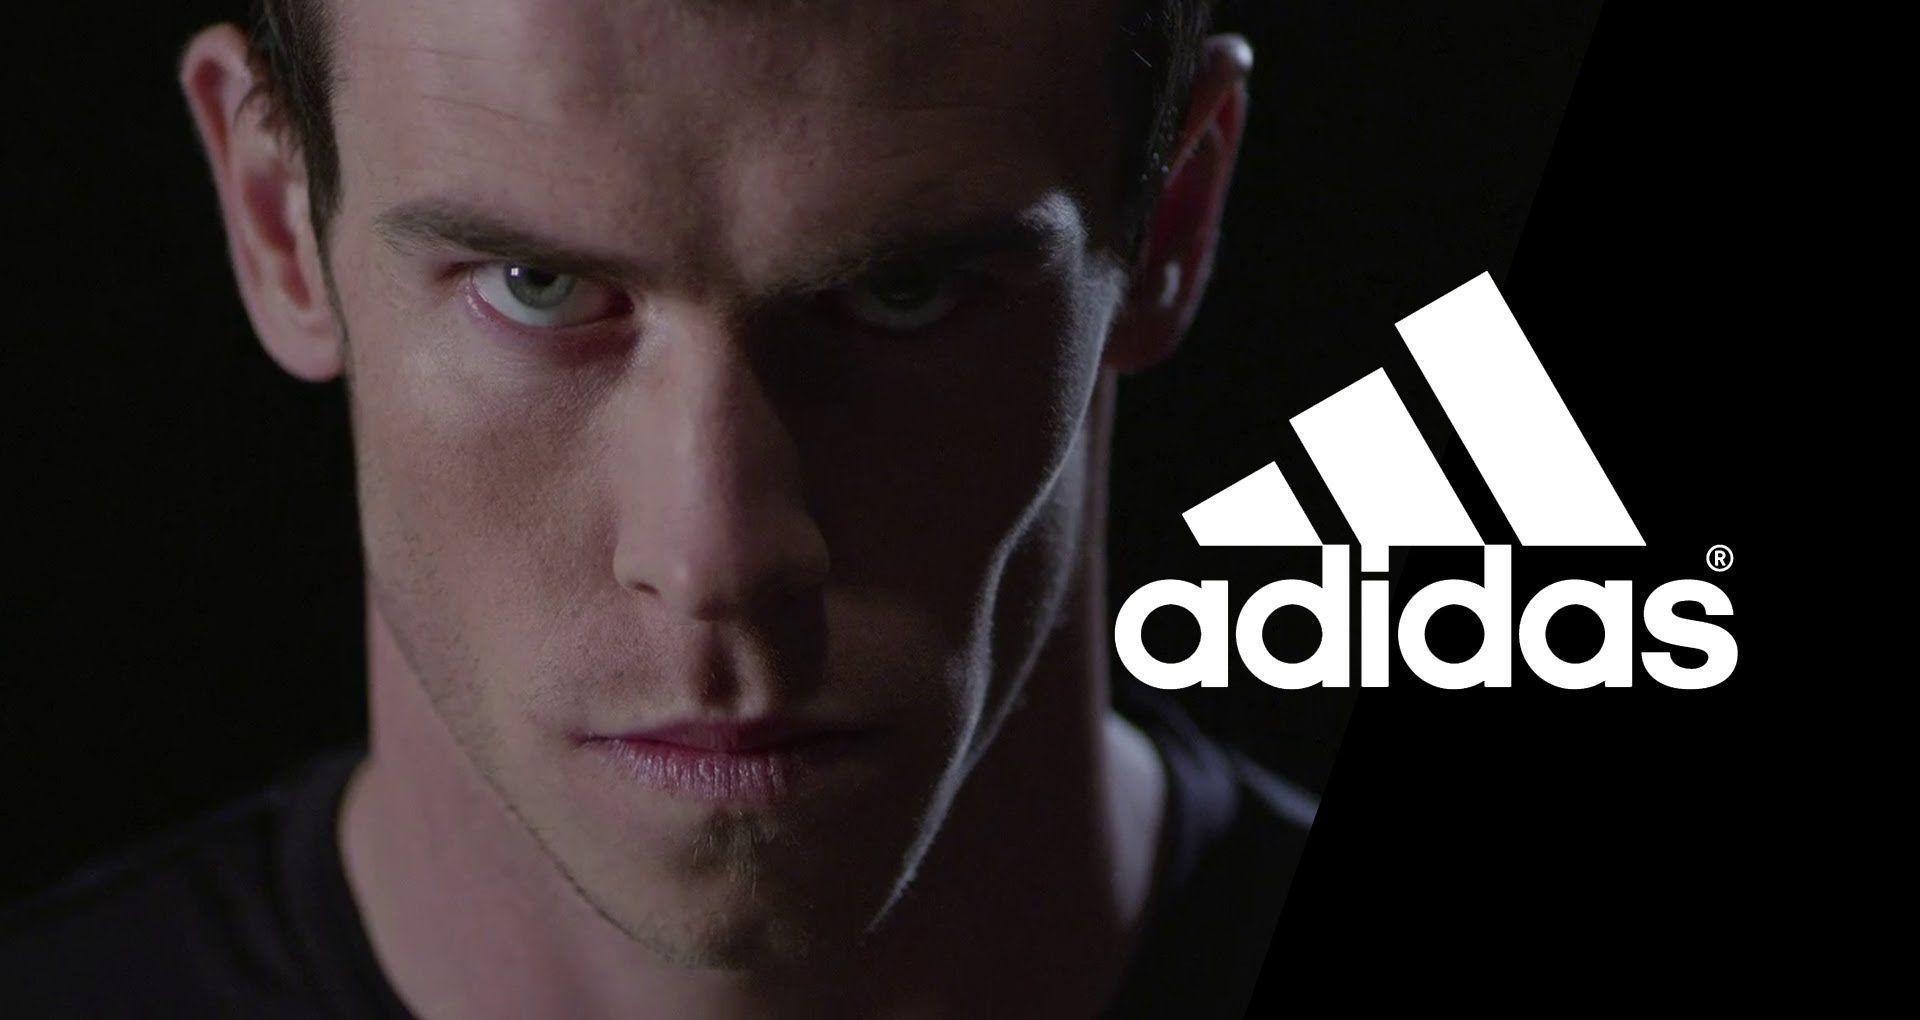 Gareth Bale Adidas Wallpaper | Download High Quality Resolution ...